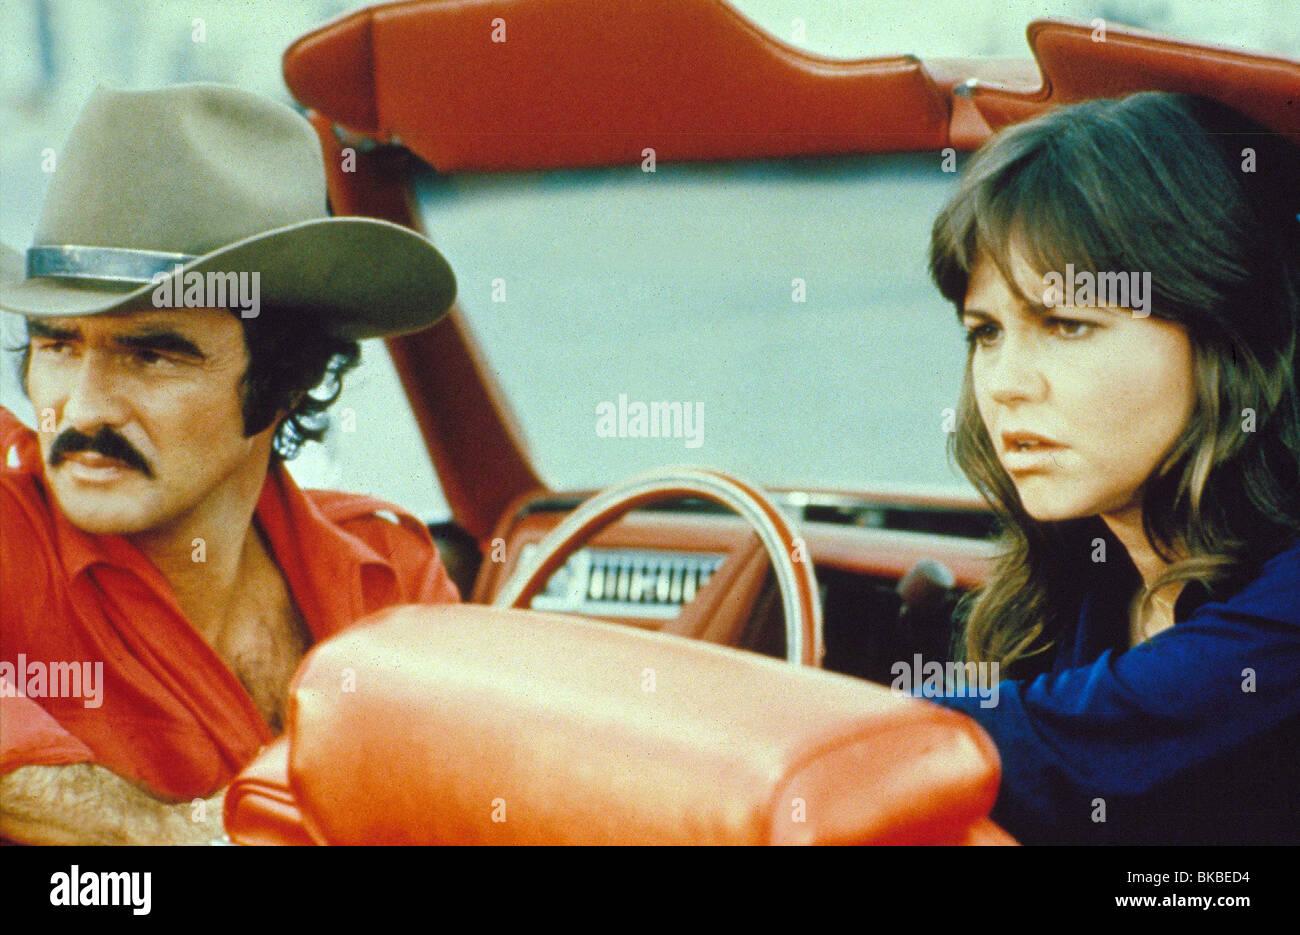 ff8c7e422723b SMOKEY AND THE BANDIT (1977) BURT REYNOLDS